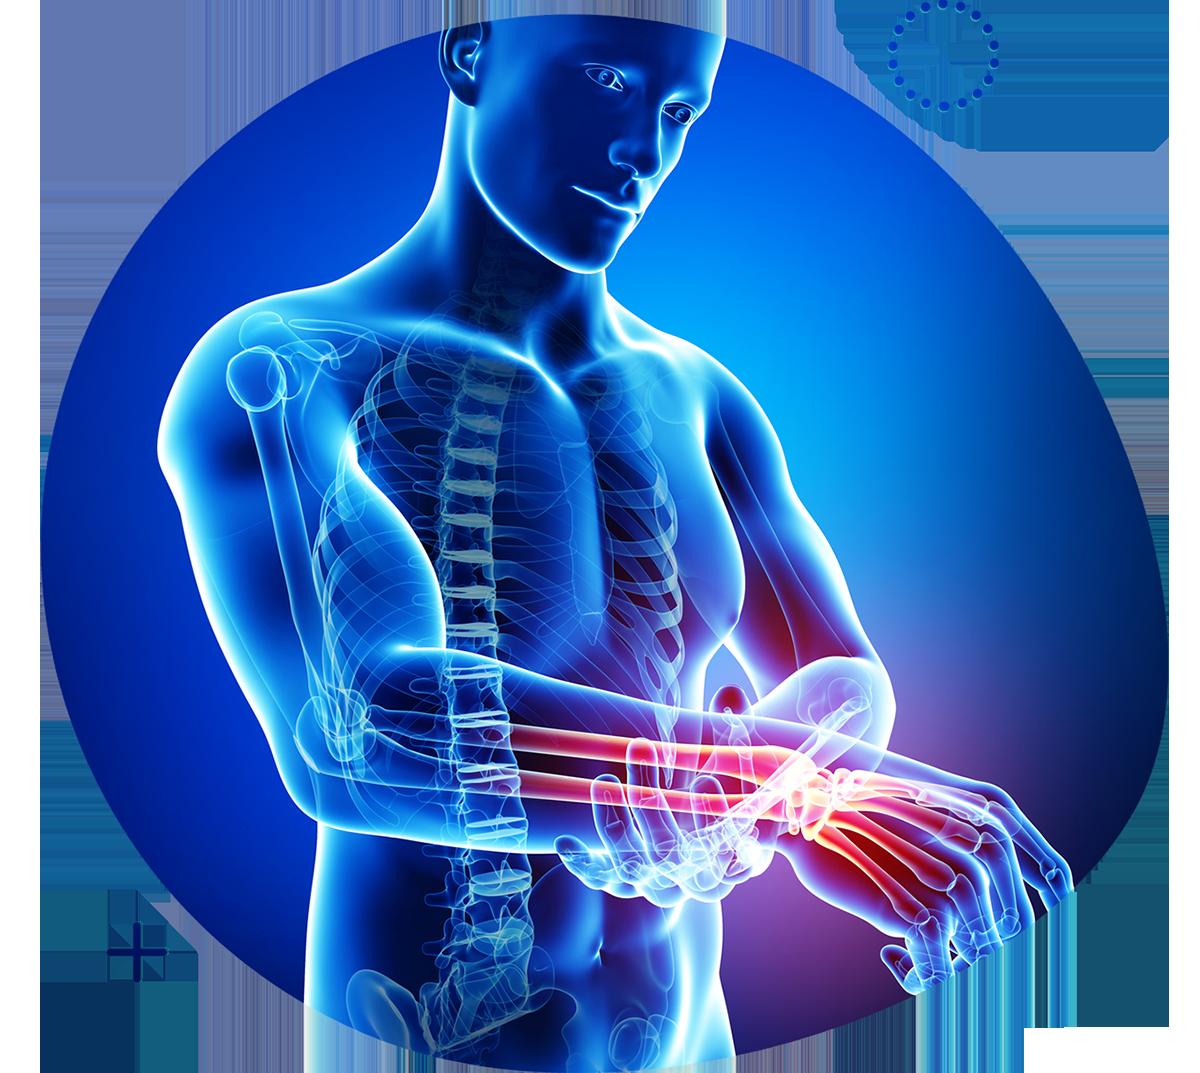 http://geoortho.ge/wp-content/uploads/2021/05/png-transparent-low-back-pain-back-injury-human-back-pain-management-lumbar-disc-disease-human-medical-pain-1.png